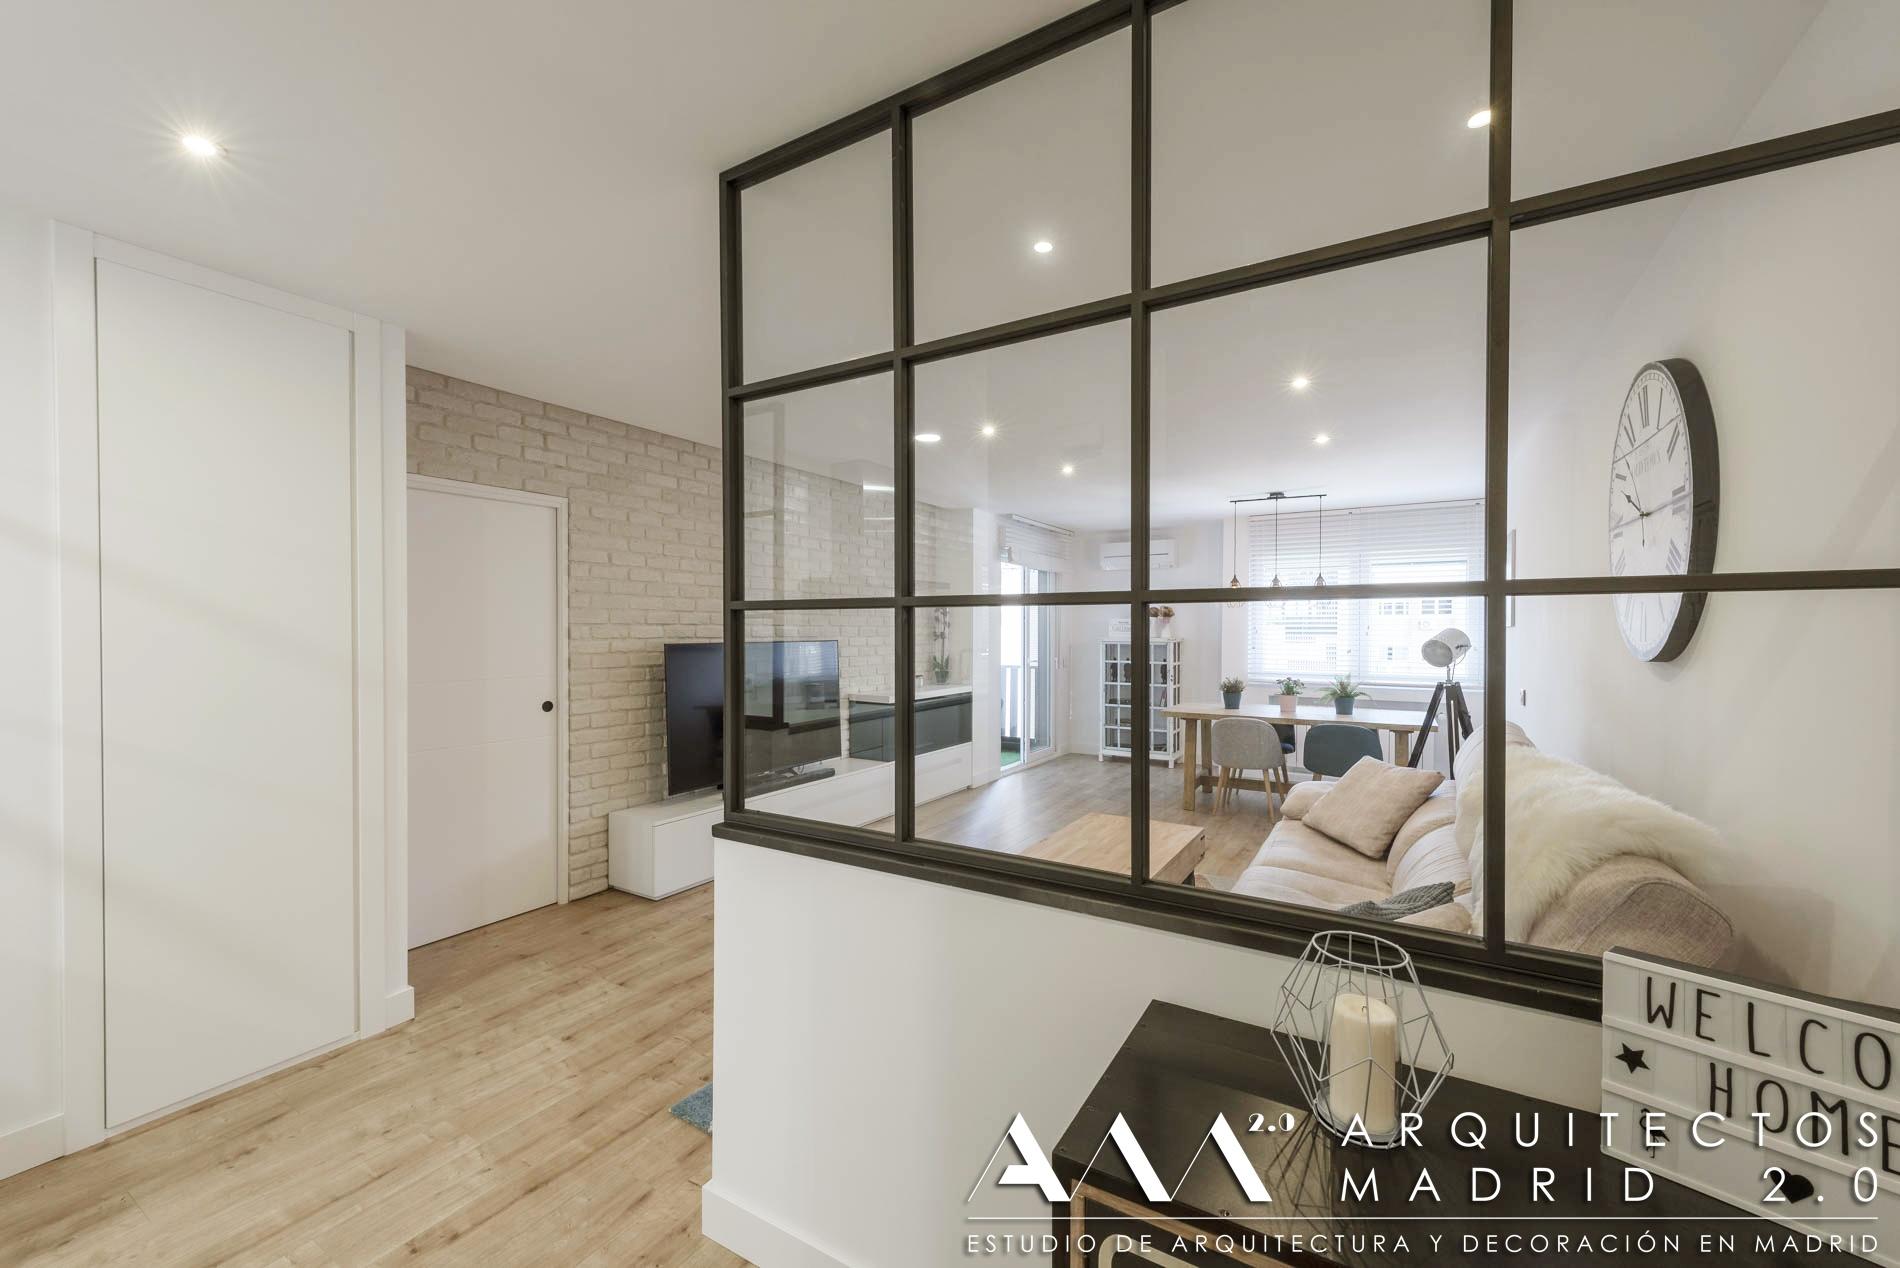 reforma-vivienda-housing-reform-architects-design-by-arquitectos-madrid-07